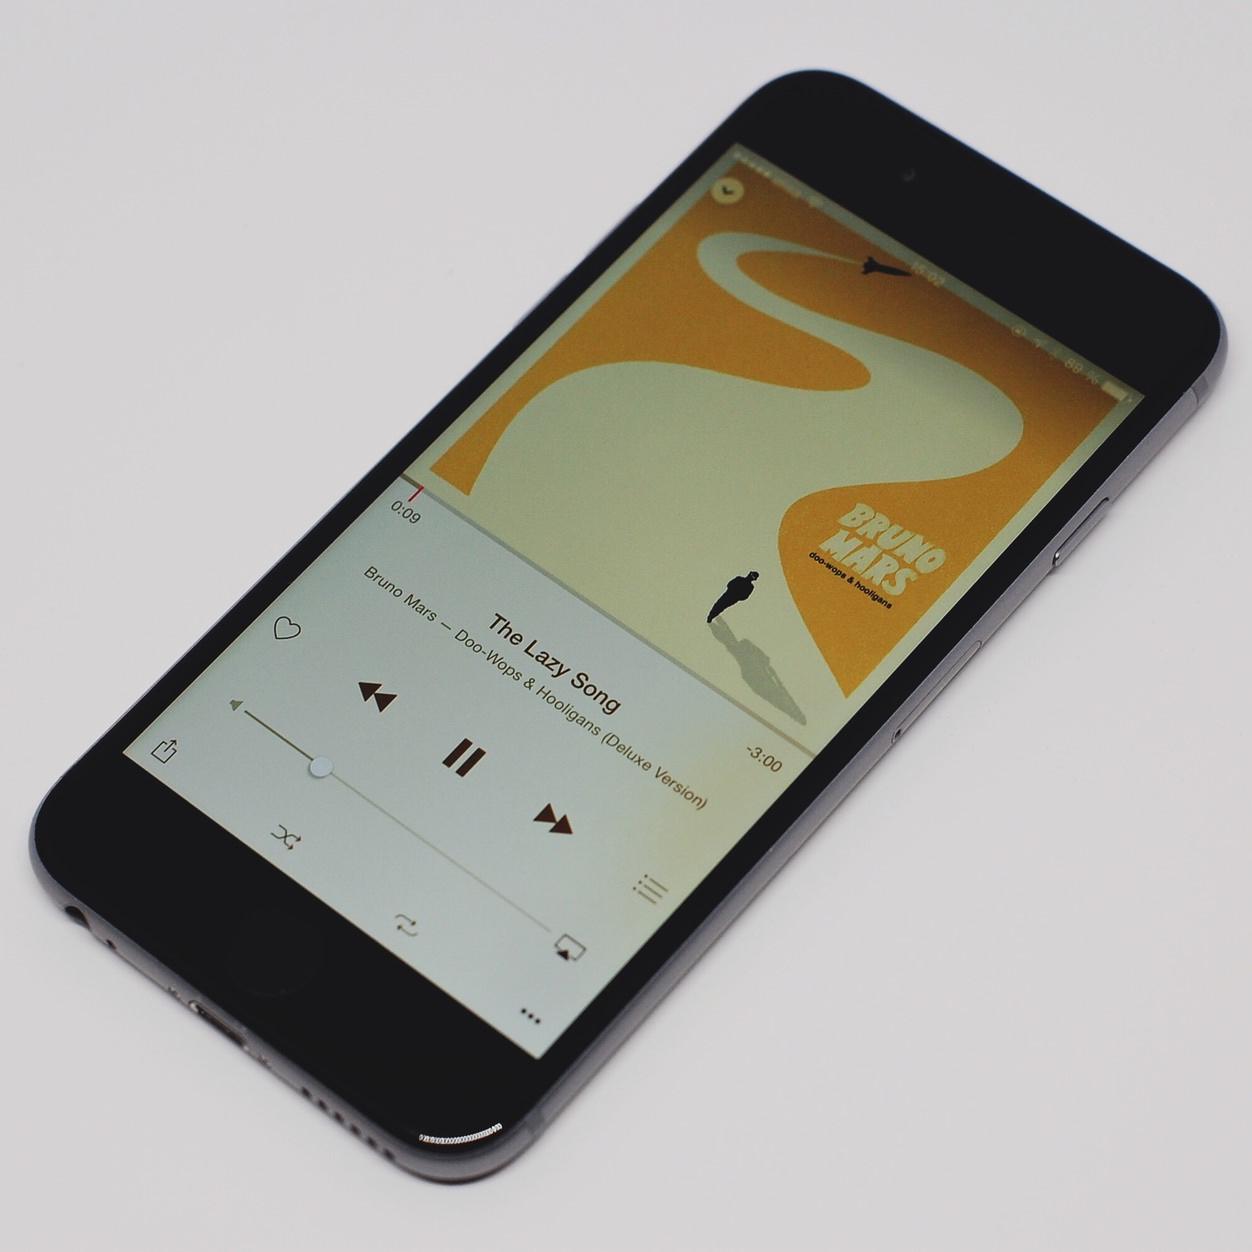 IPhoneBlog de Music Miete a